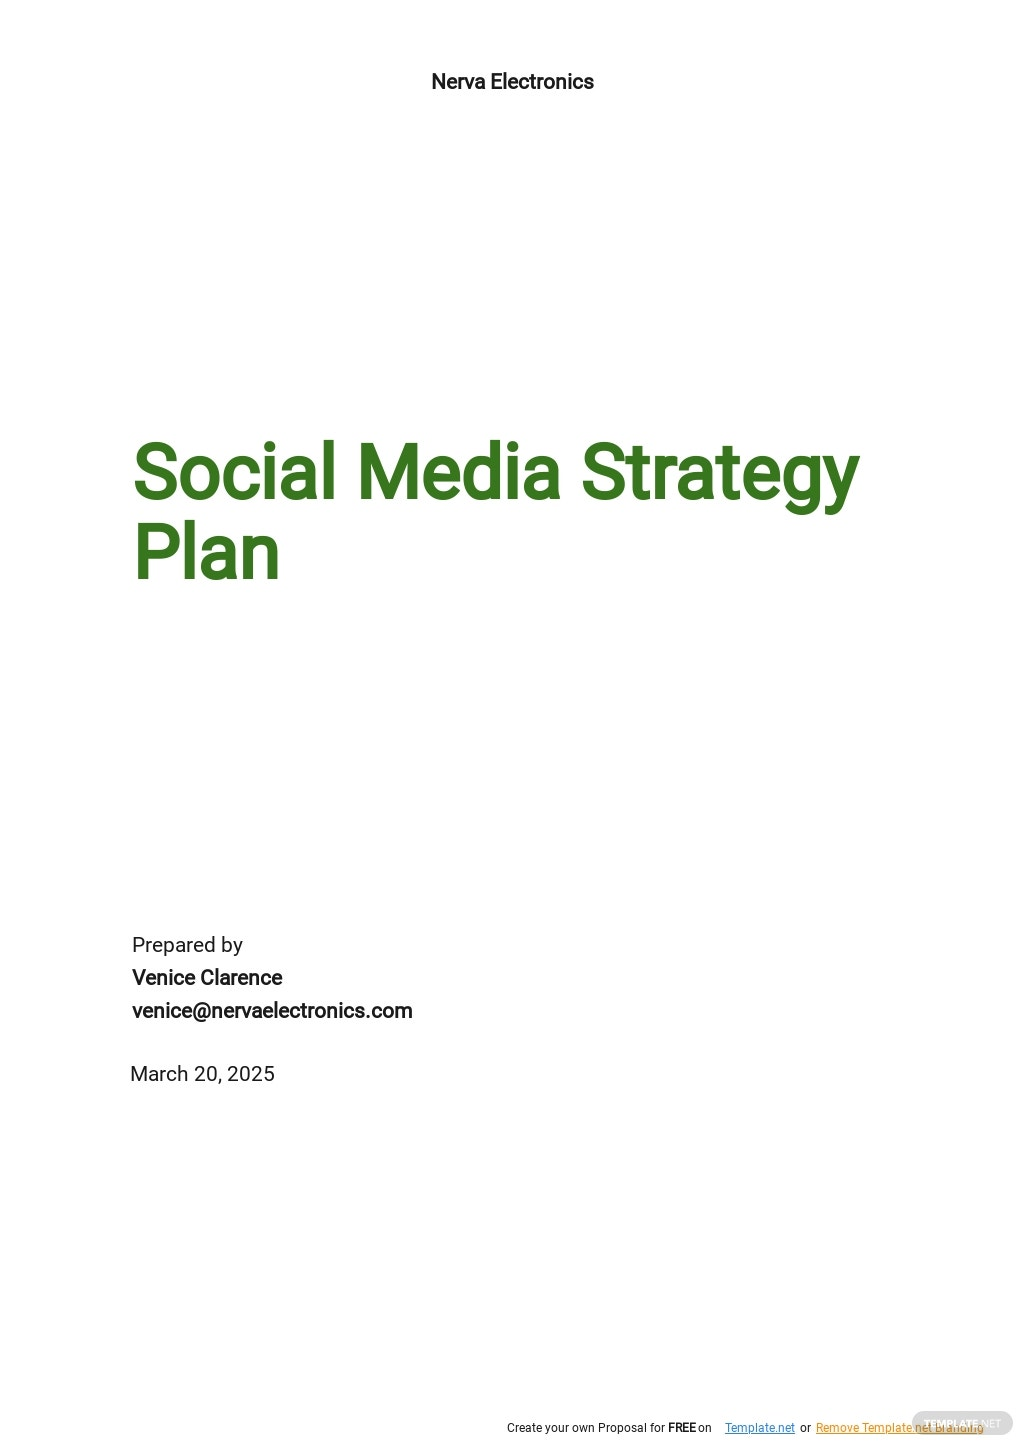 Social Media Strategy Plan Template.jpe